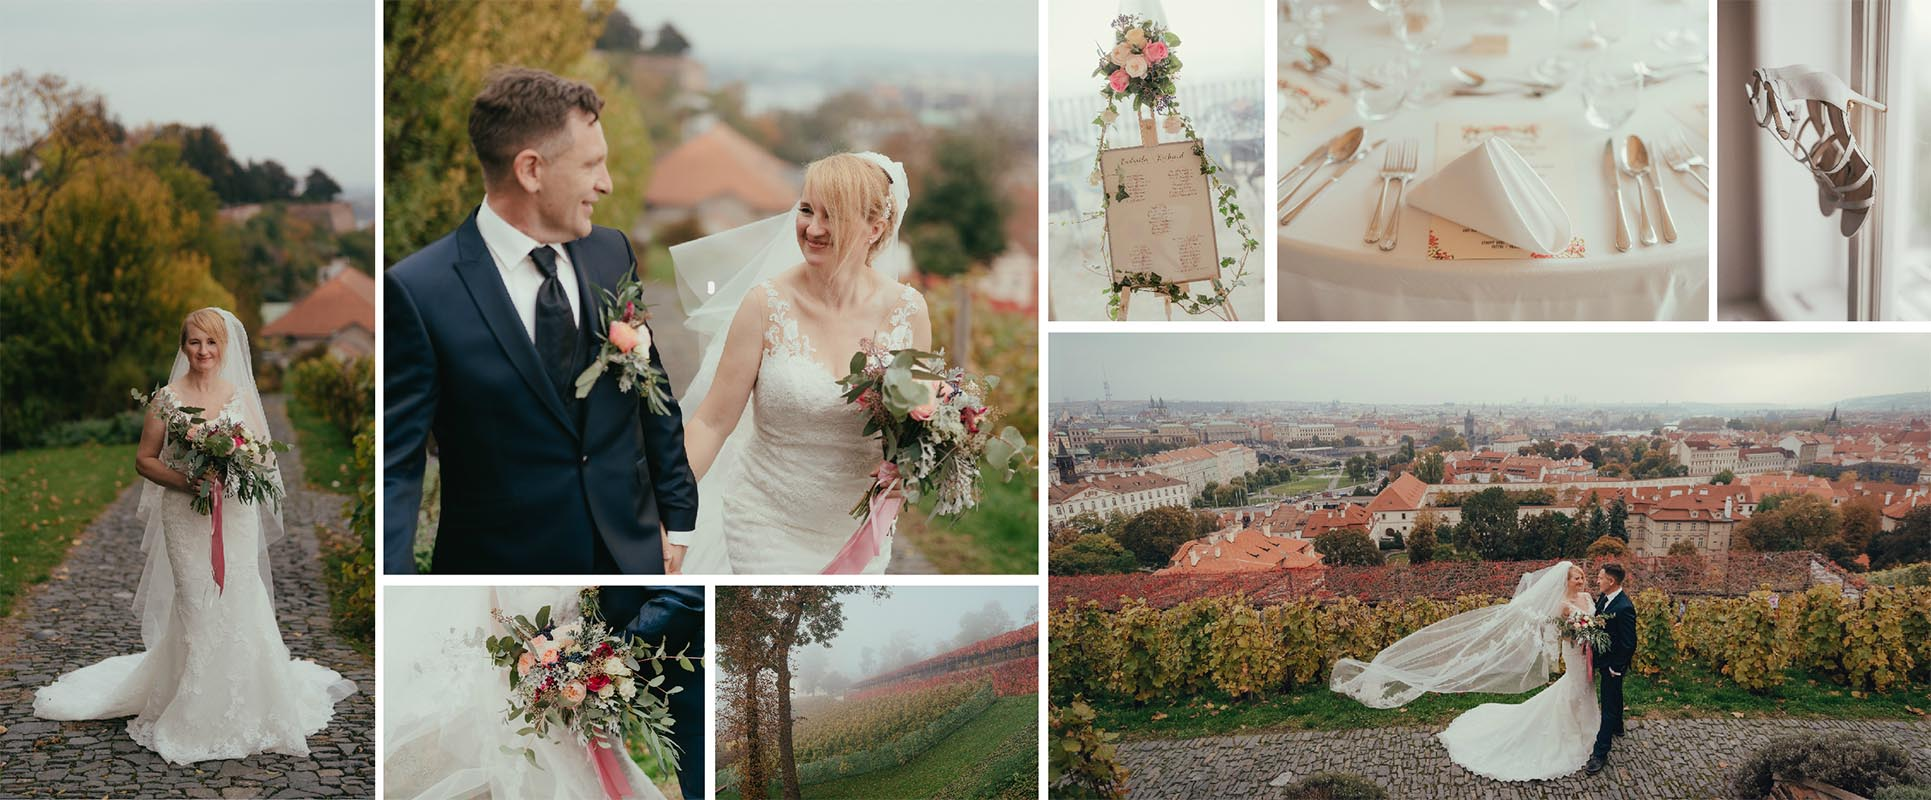 Wedding Factory Svatební agentura Praha Svatba koláž